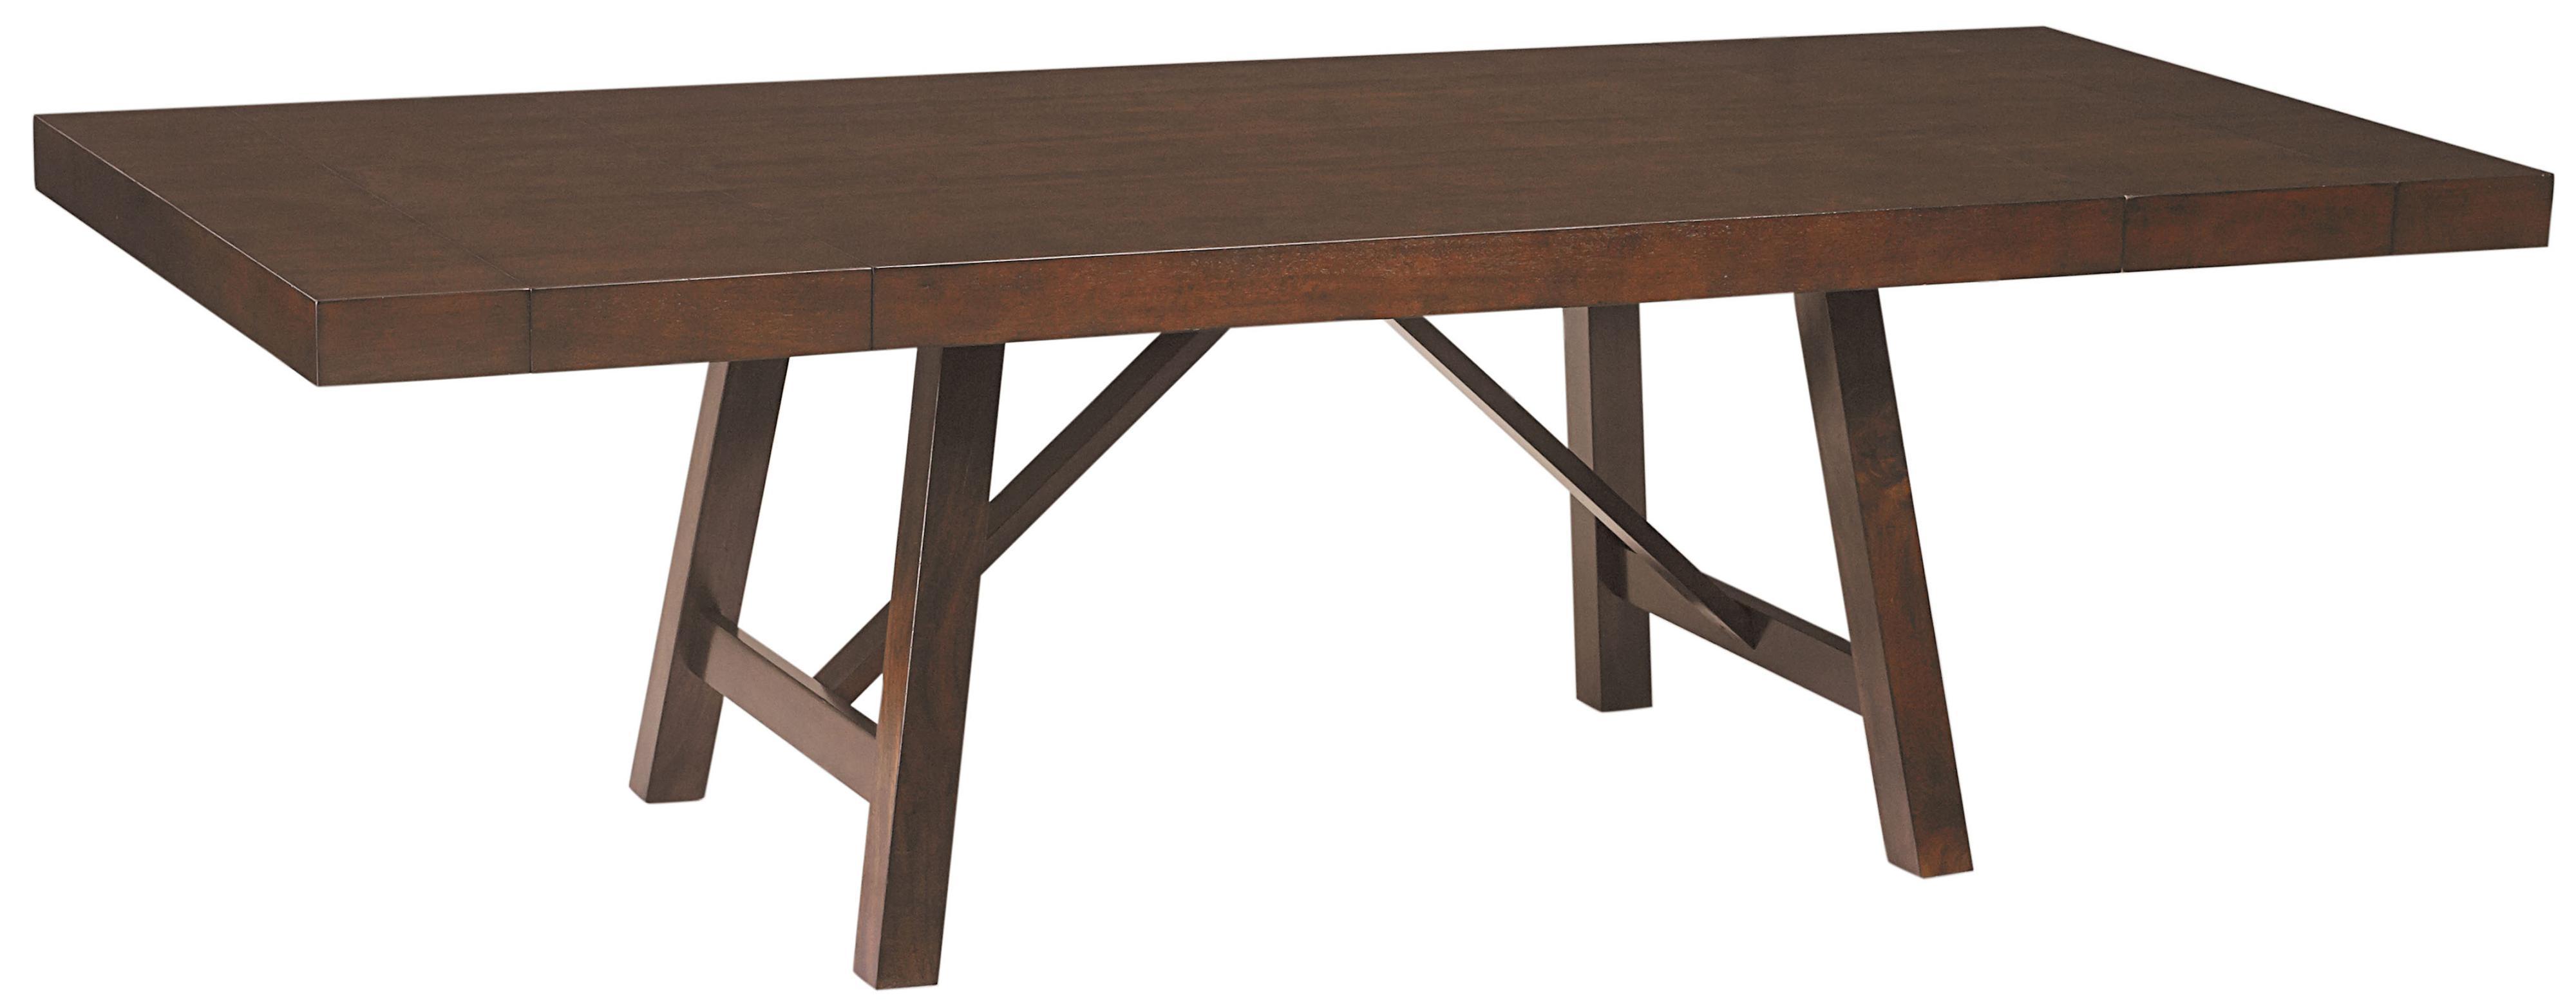 standard sofa table length fulham fc v nottingham forest sofascore height free of end